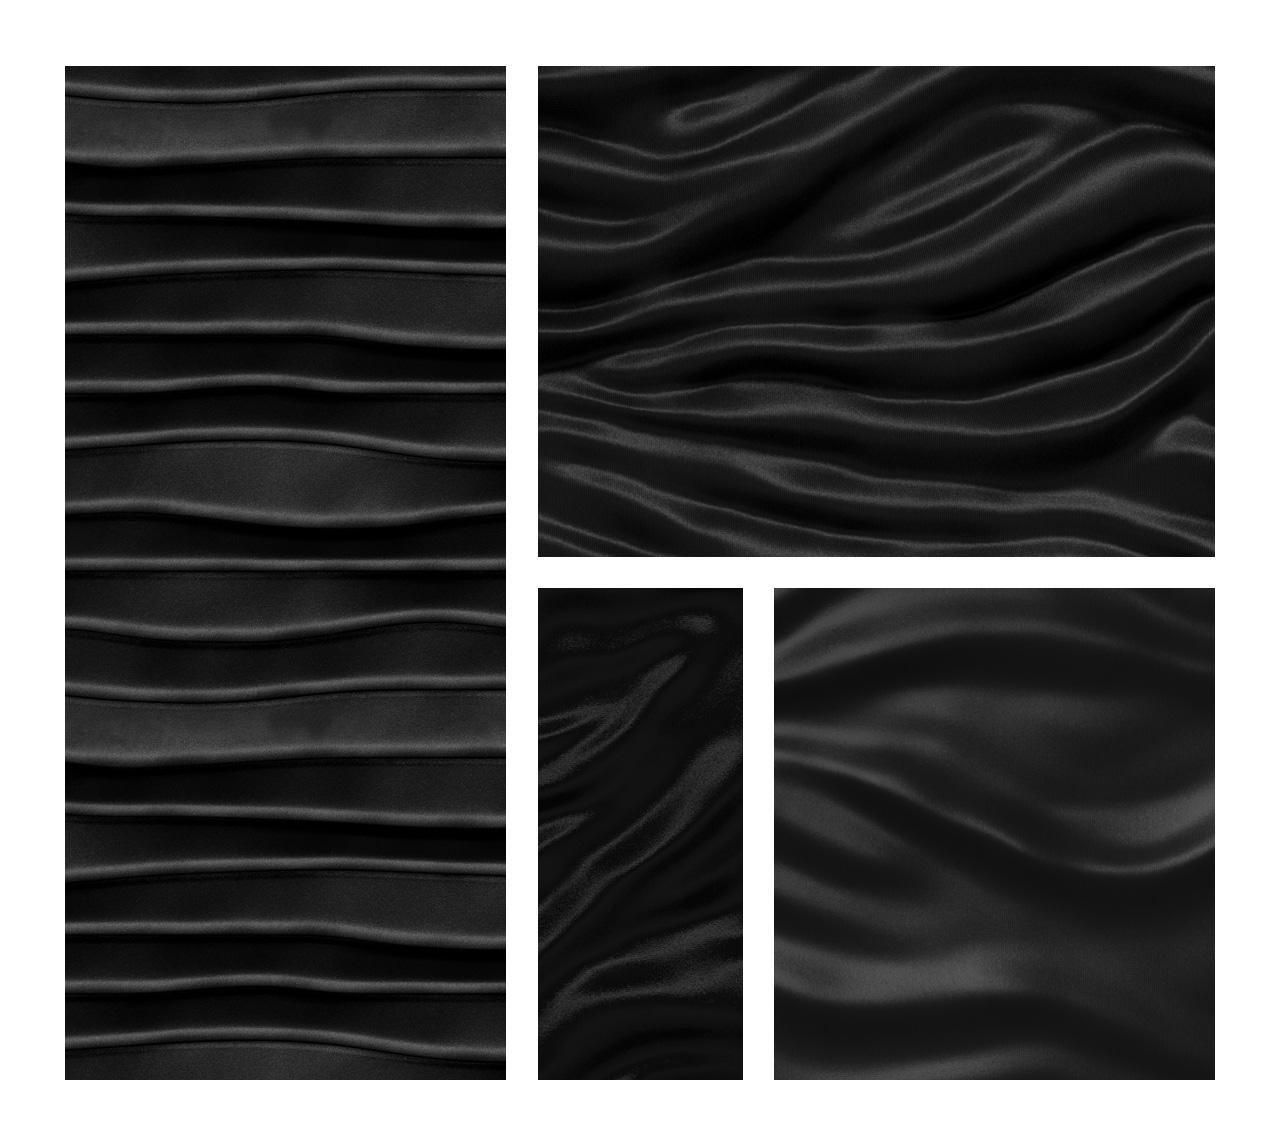 Silk / Satin Textures for Photoshop